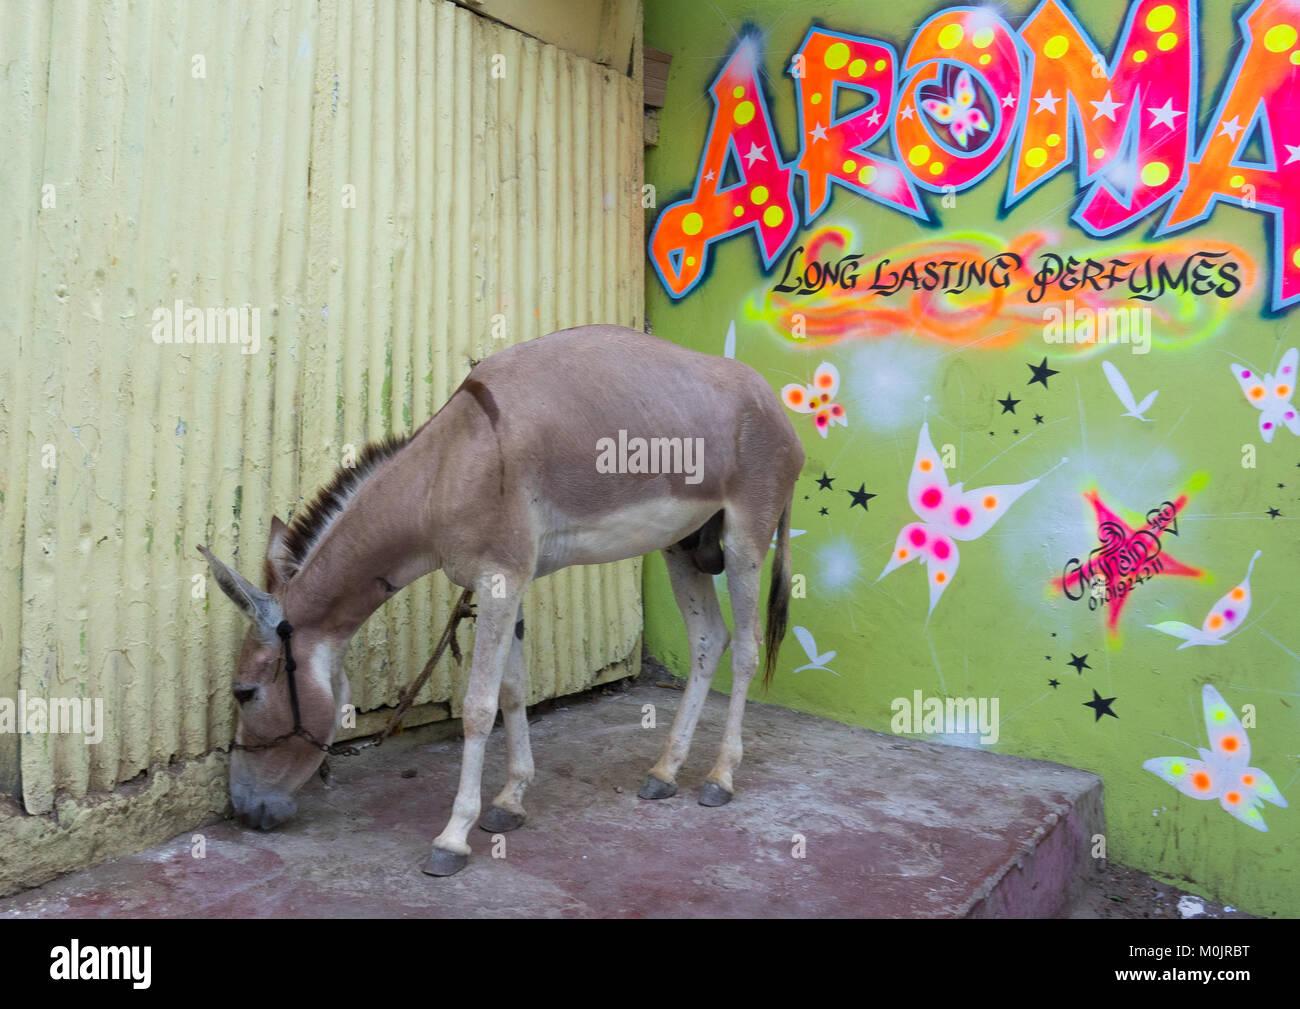 Donkey in front of a perfumery in the streets of Lamu Town, Lamu island, Kenya Stock Photo